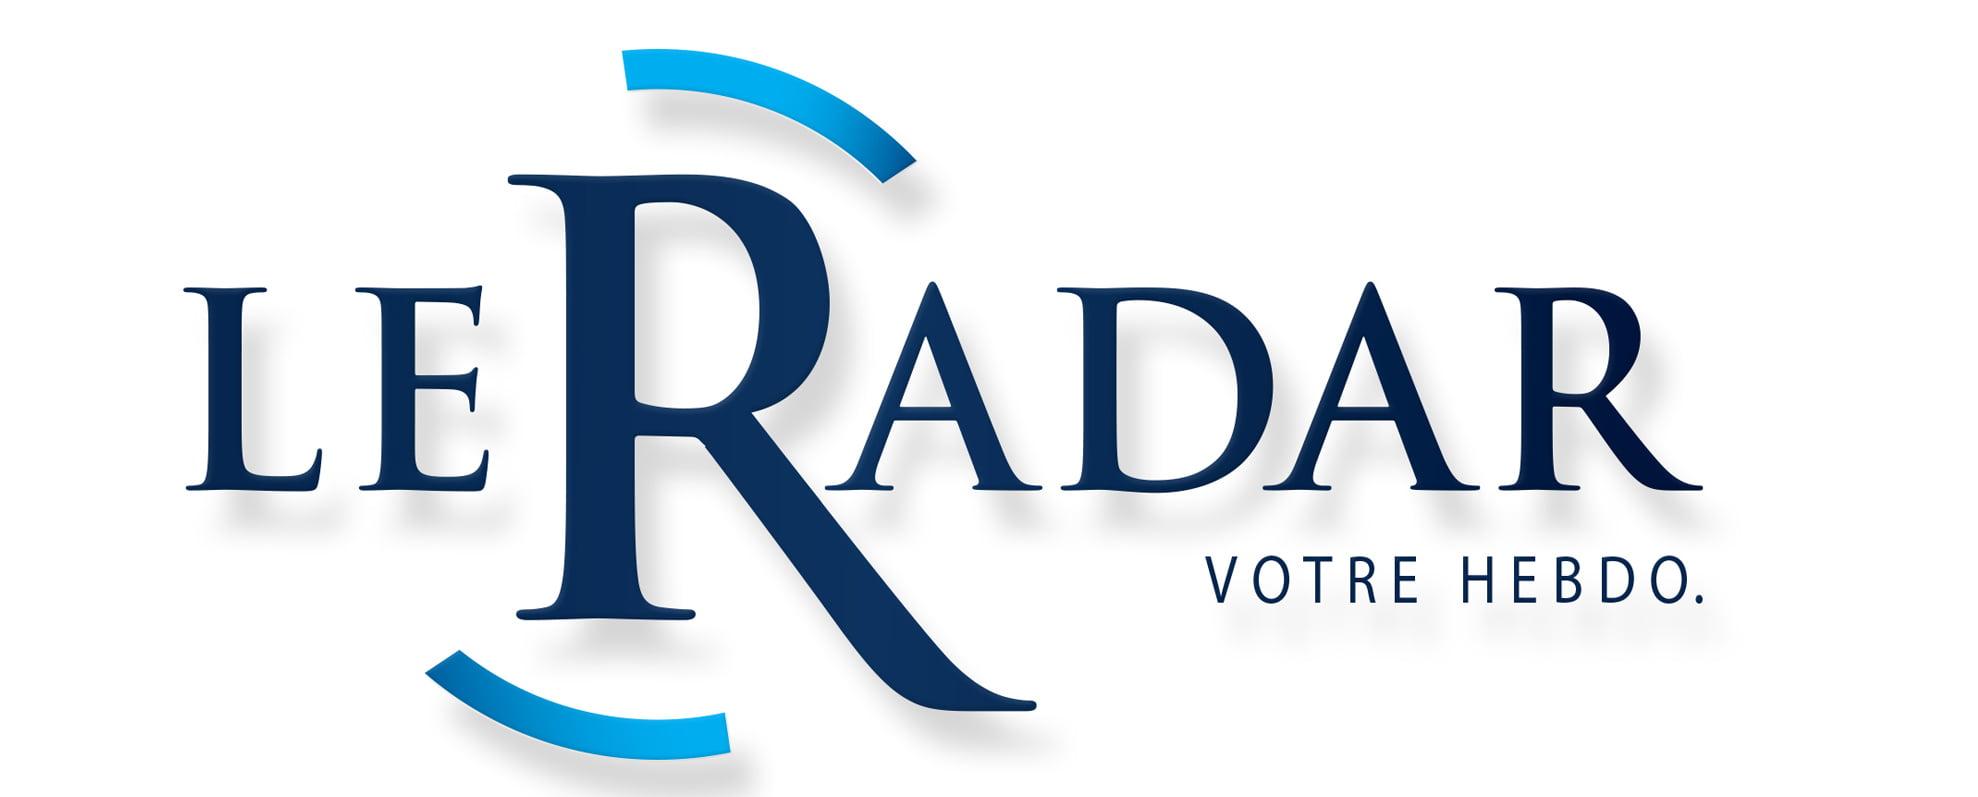 Le Radar